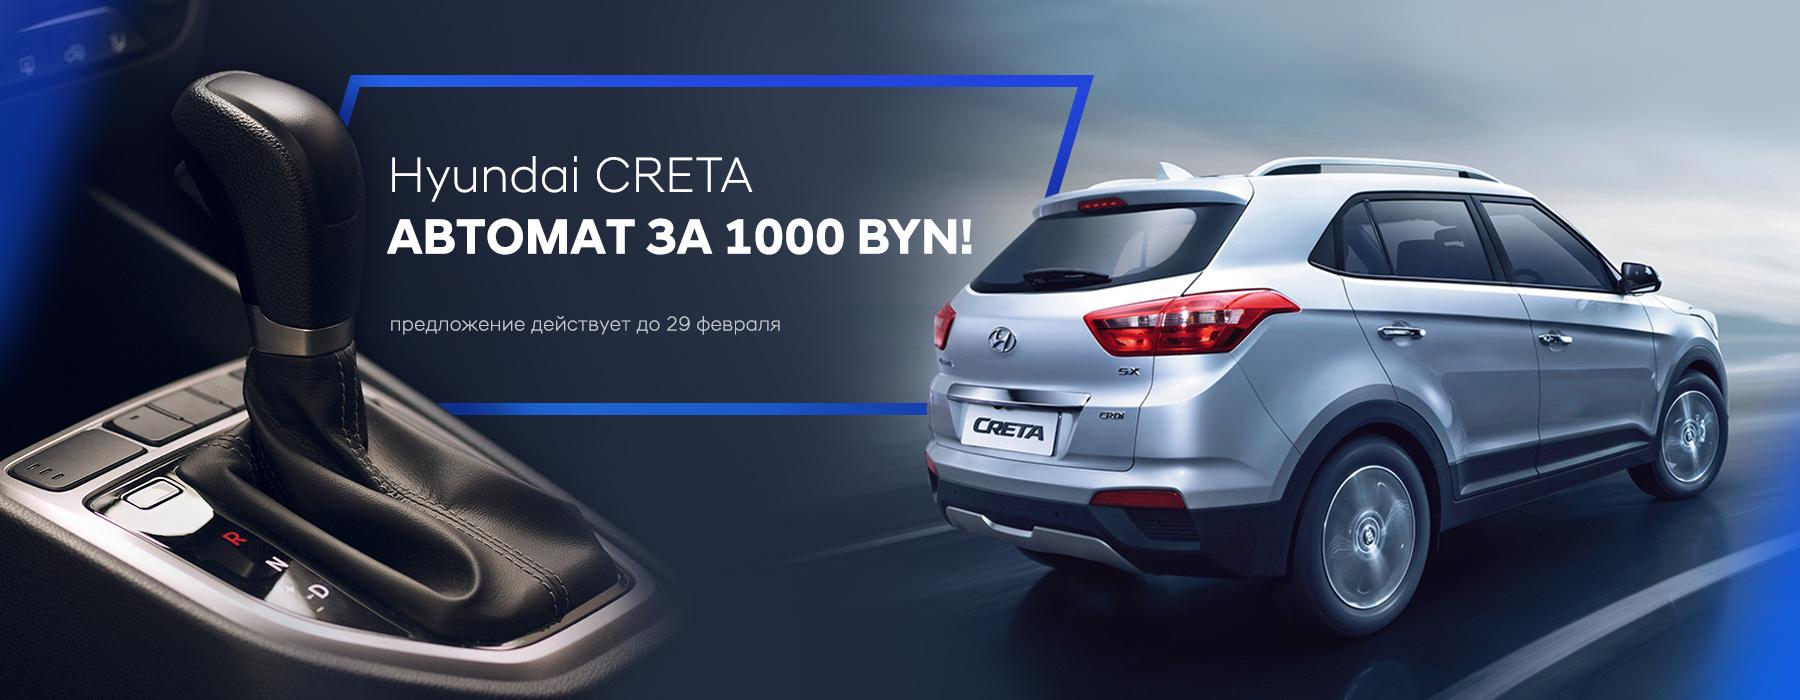 Небывалая акция на Hyundai Creta!